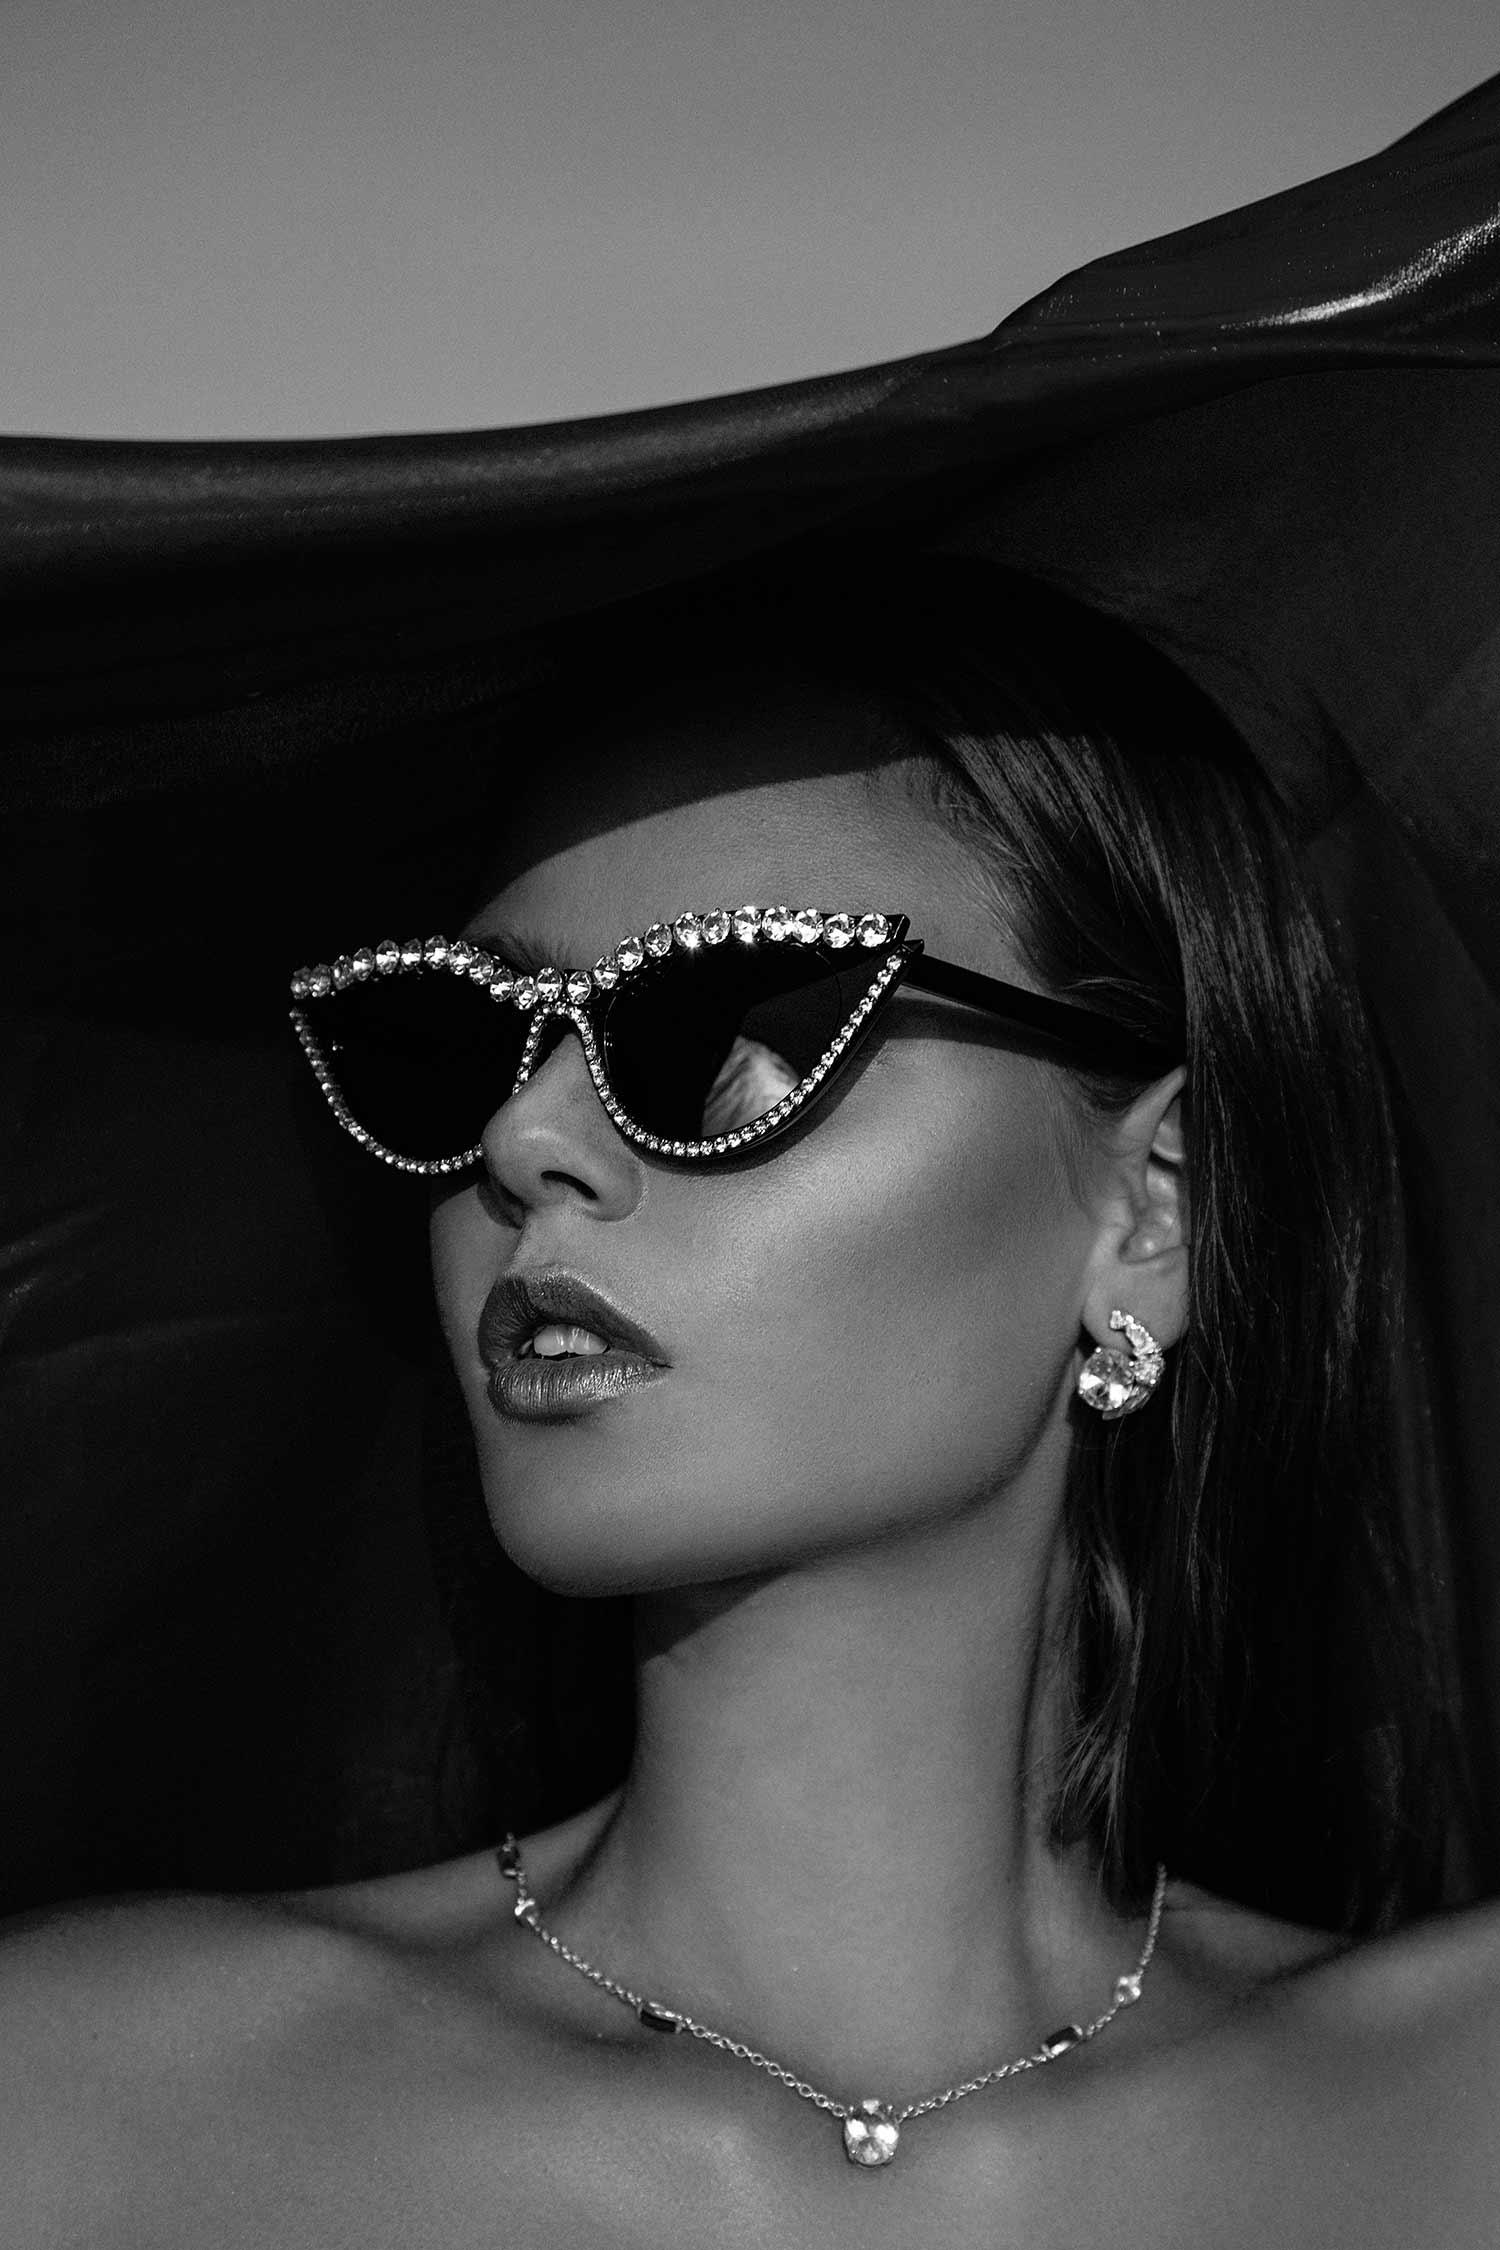 Black and white image of model wearing Zydrune Topaz earrings and elegant gemstone necklace.